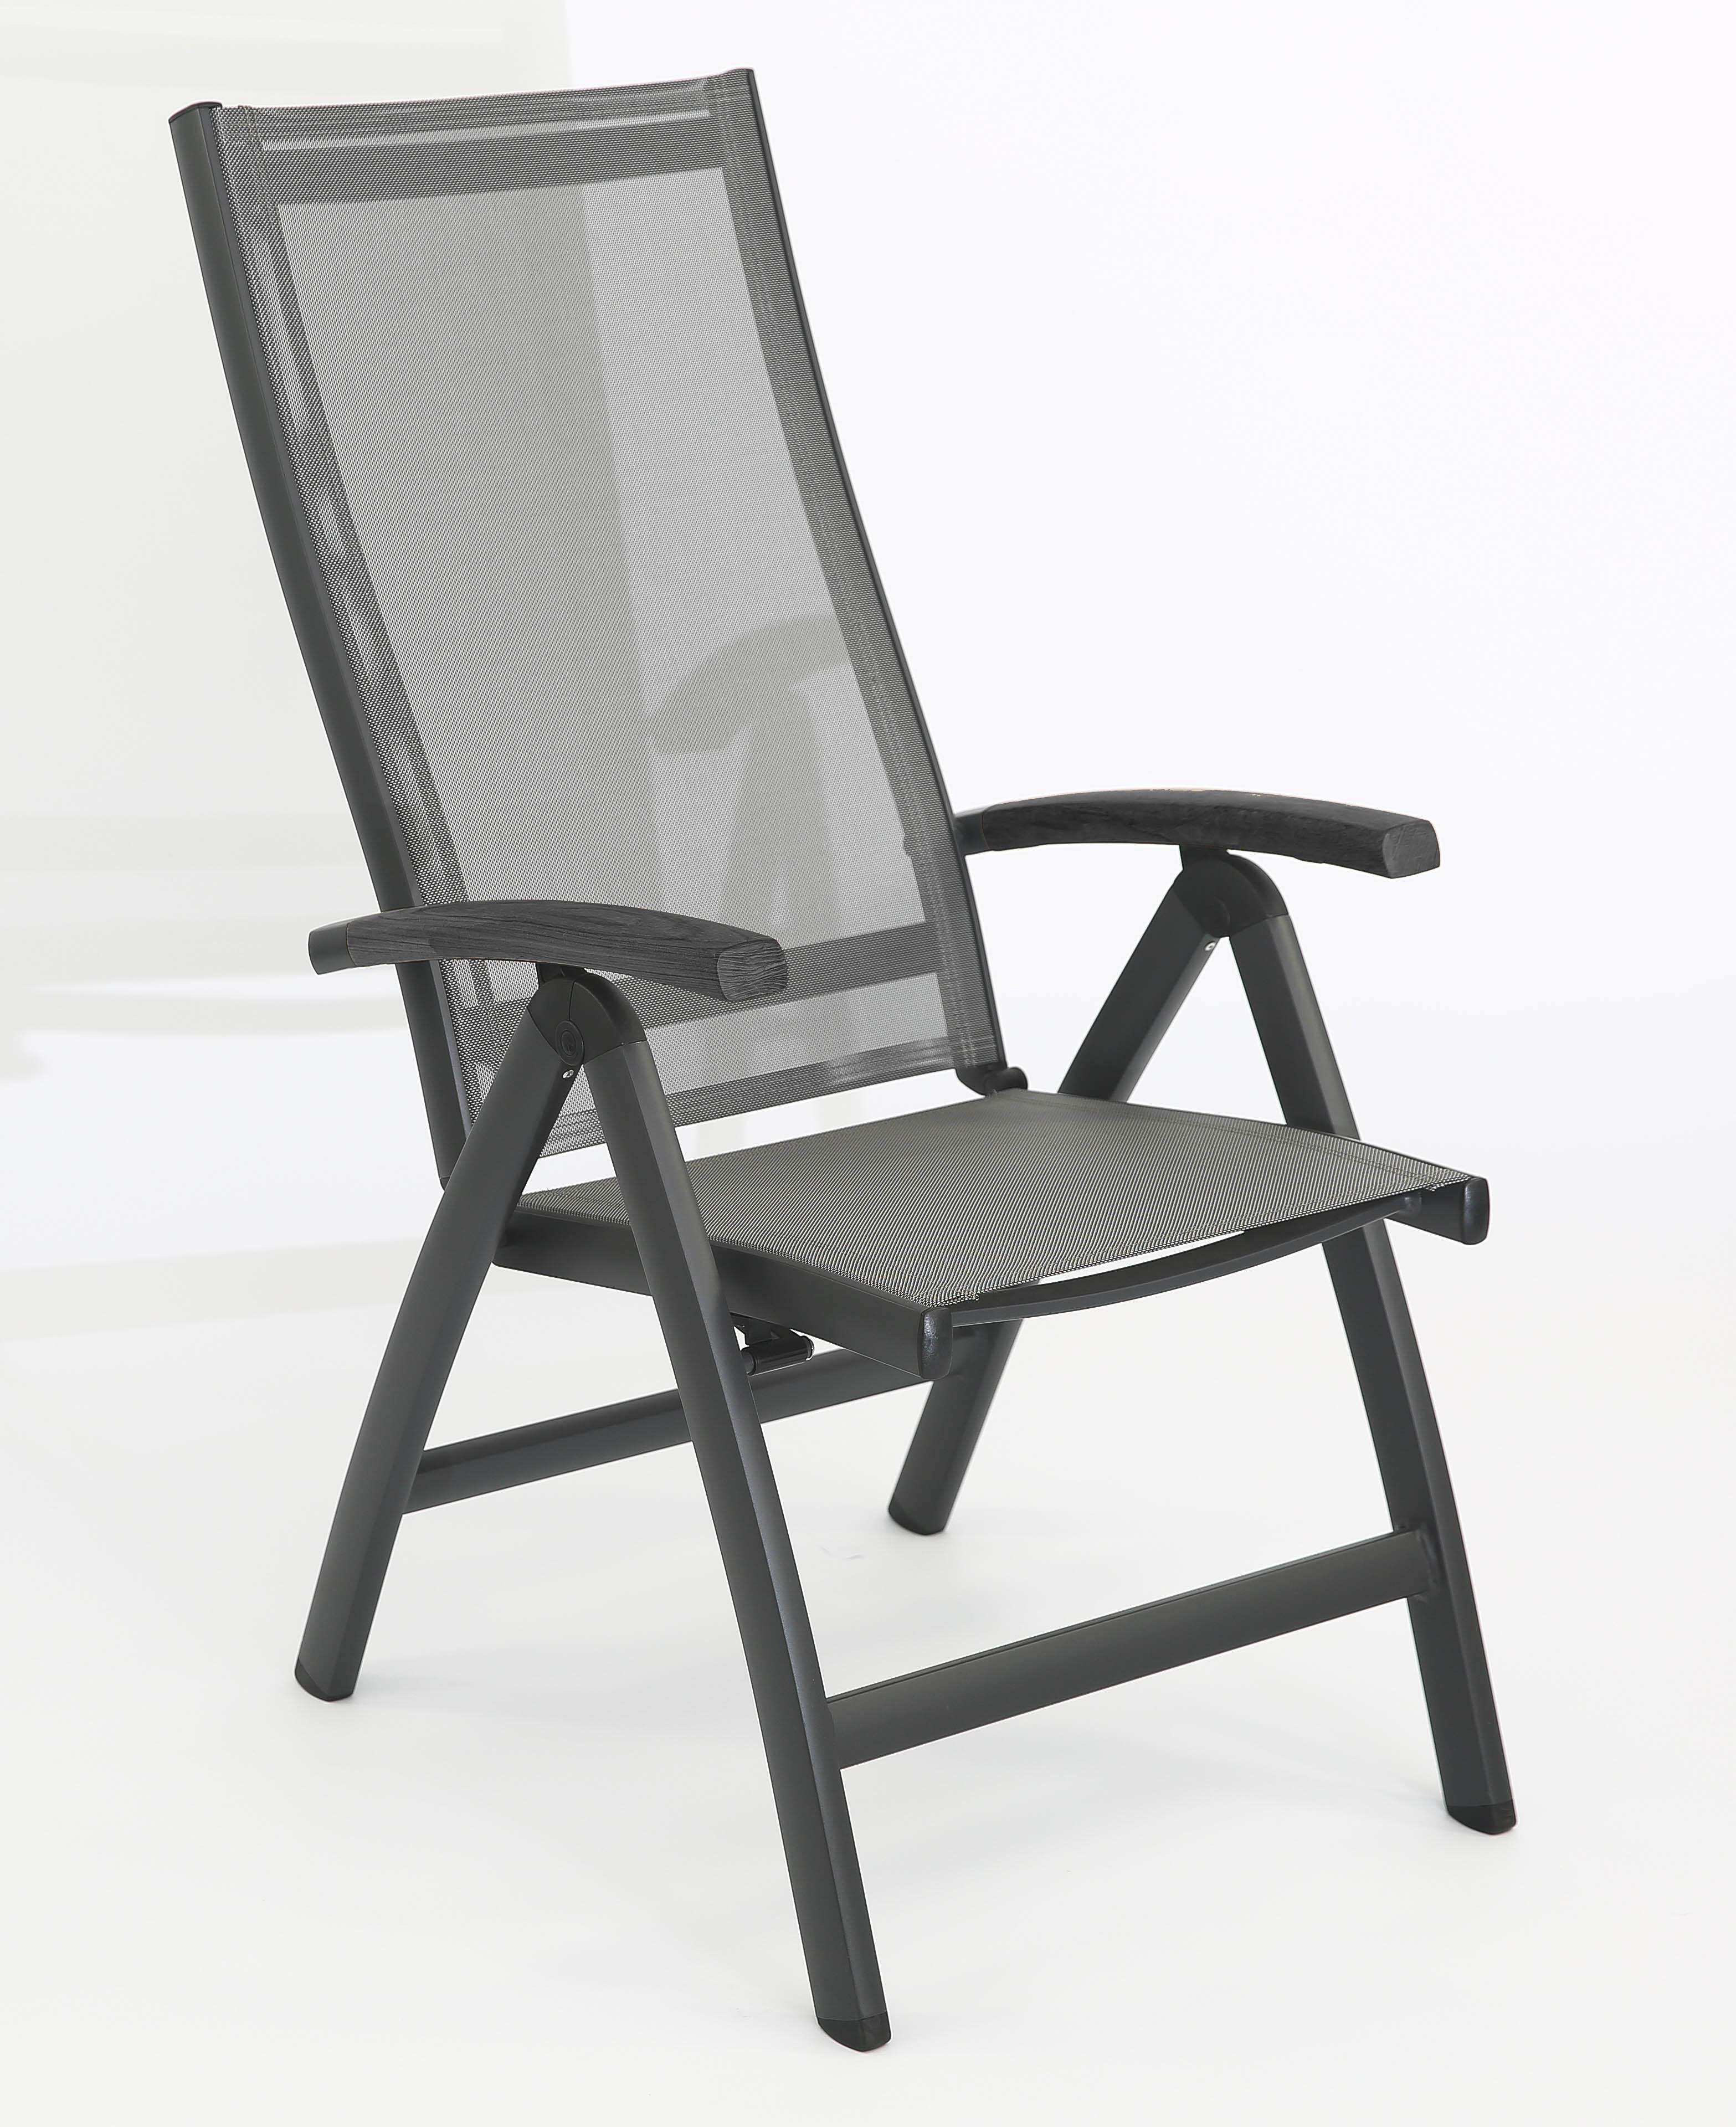 hauskatalog 2018 bumb gartenm bel karlsruhe. Black Bedroom Furniture Sets. Home Design Ideas